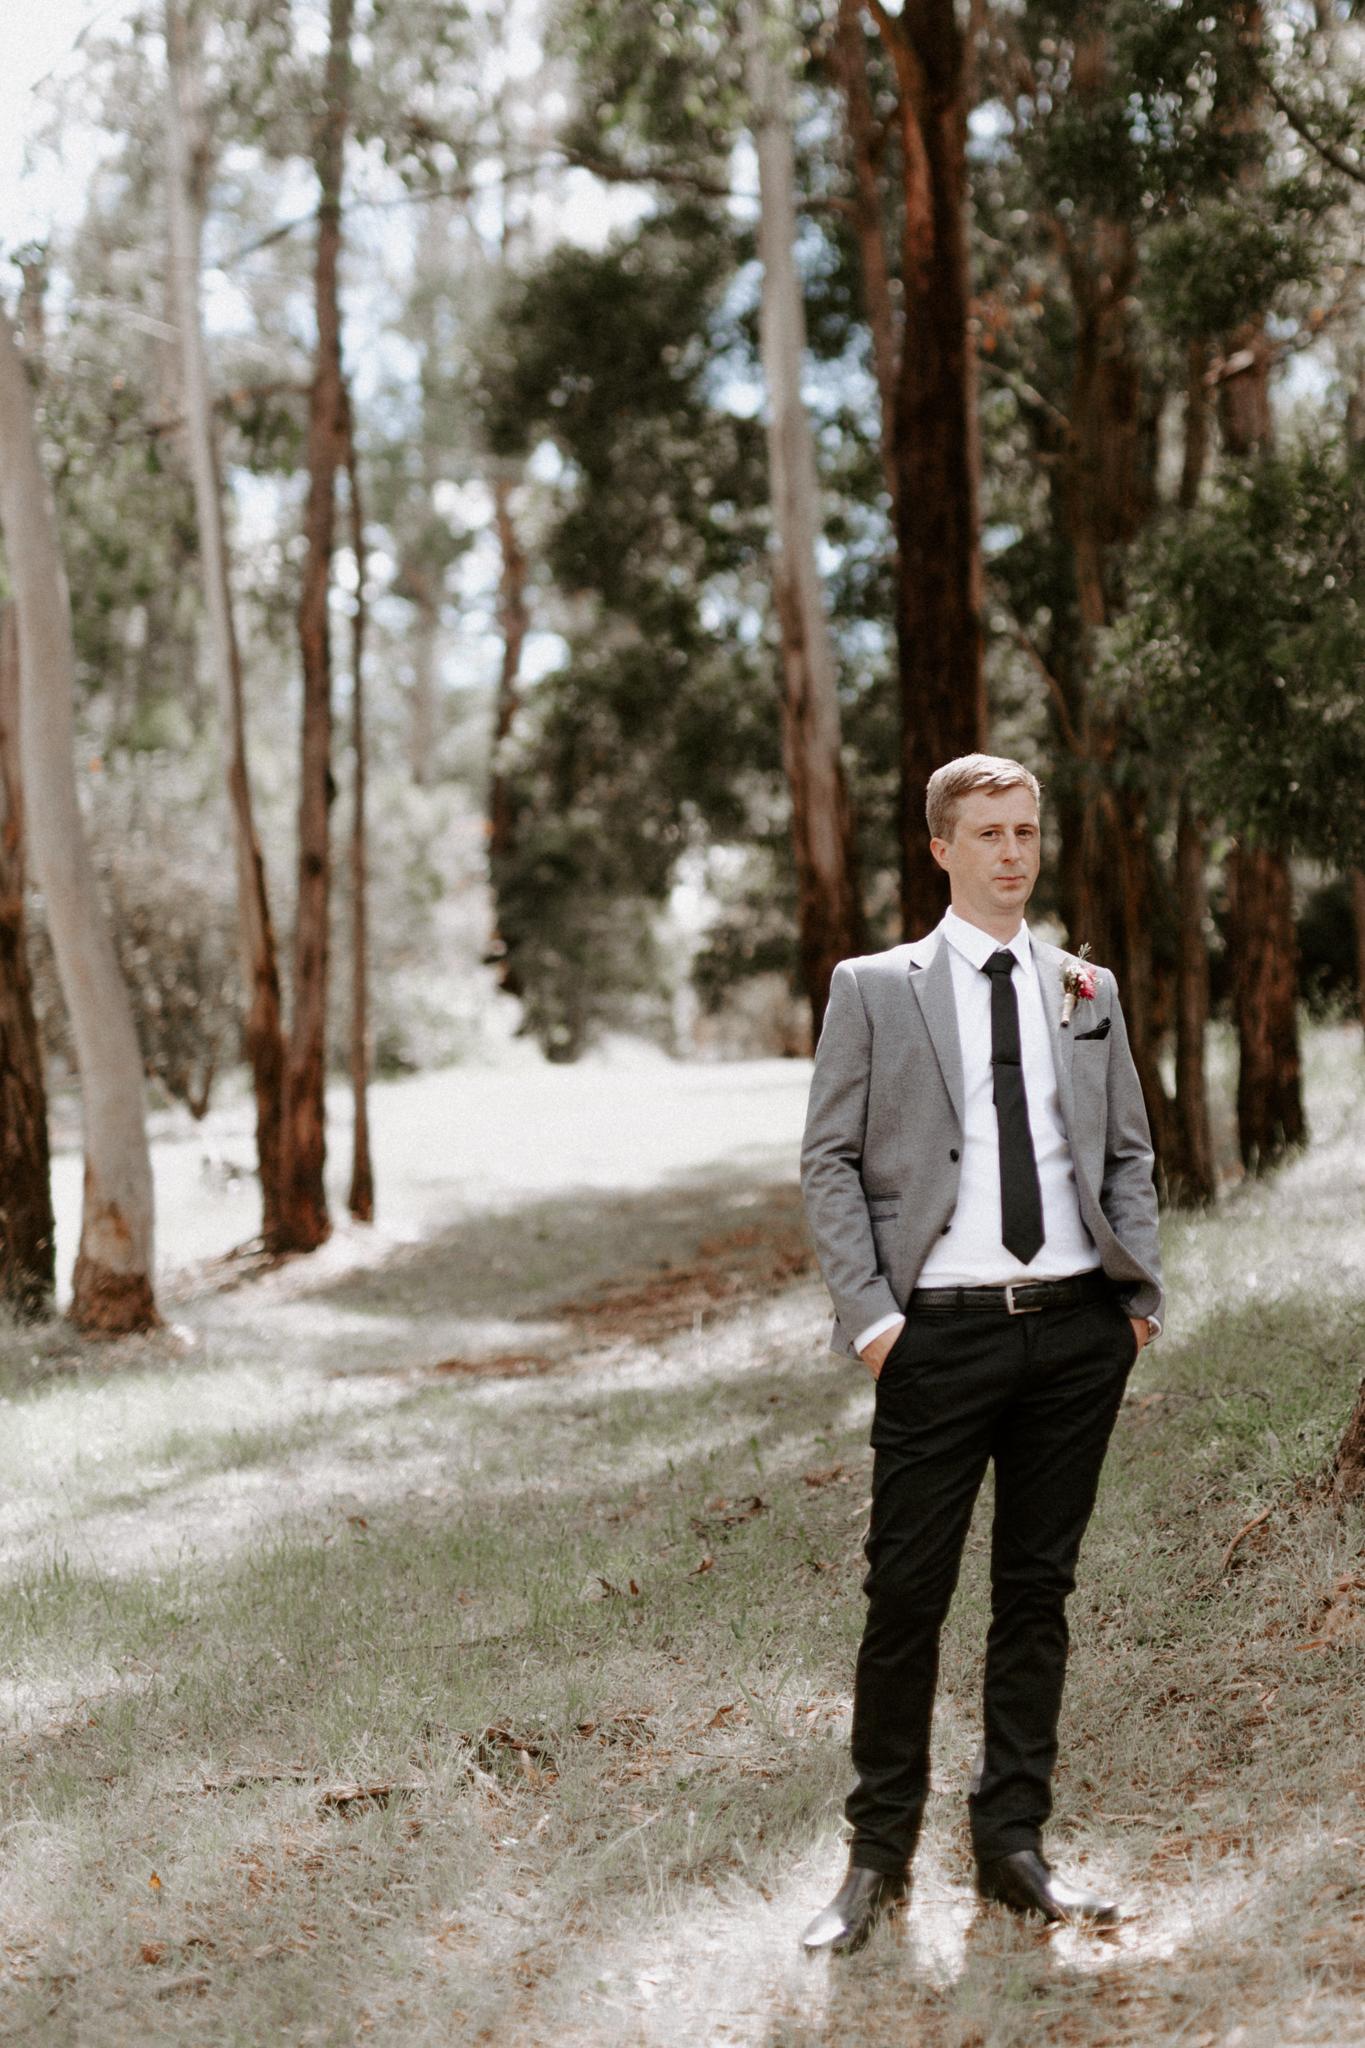 Wandin-Park-Estate-Wedding-Emotions-and-Math-Photography-034.jpg